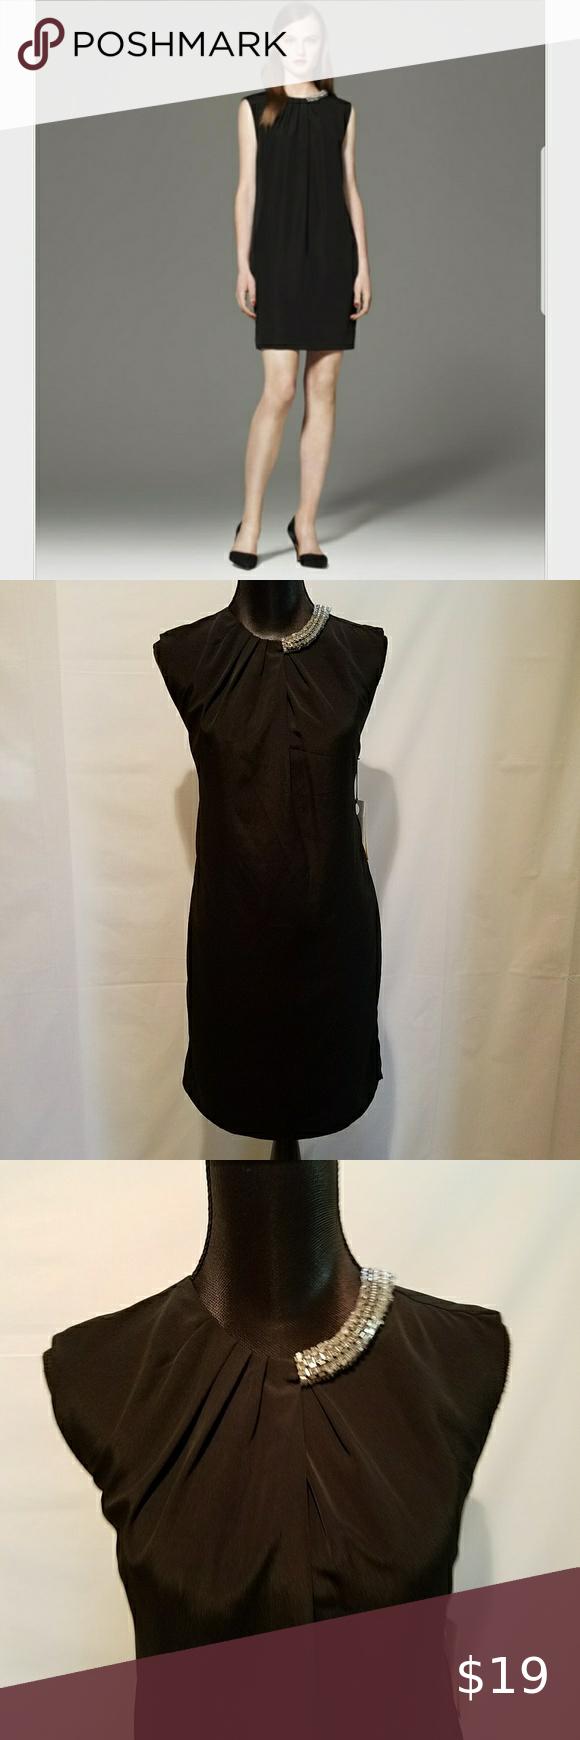 3 1 Phillip Lim For Target Nwt Black Dress Sz S Dress Size Chart Women Mixed Print Dress Clothes Design [ 1740 x 580 Pixel ]